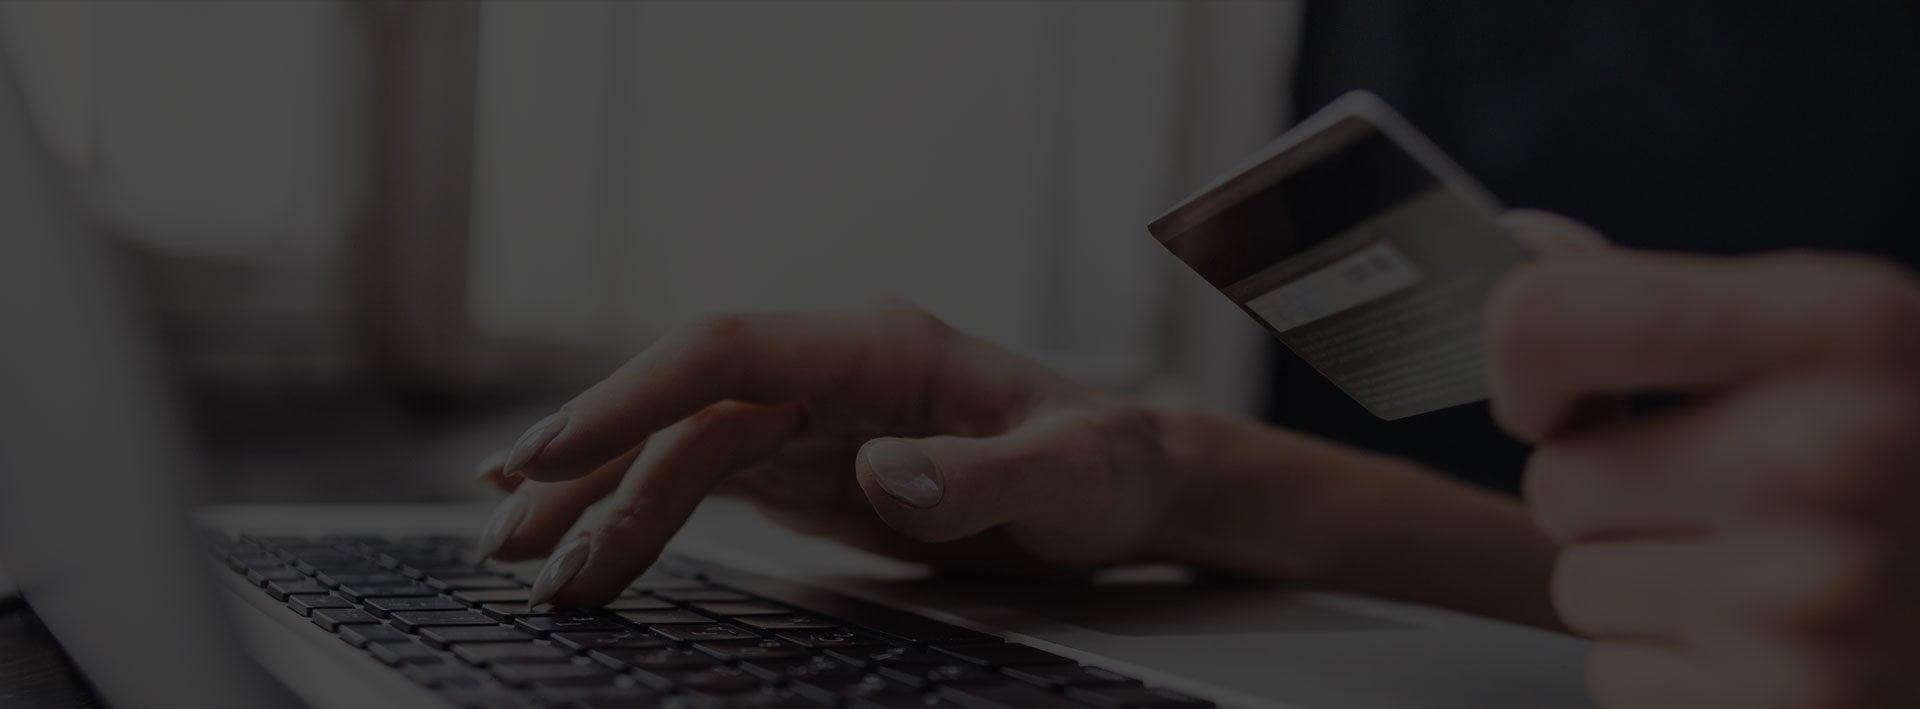 E-Commerce Fraud Prevention Solutions for Retail